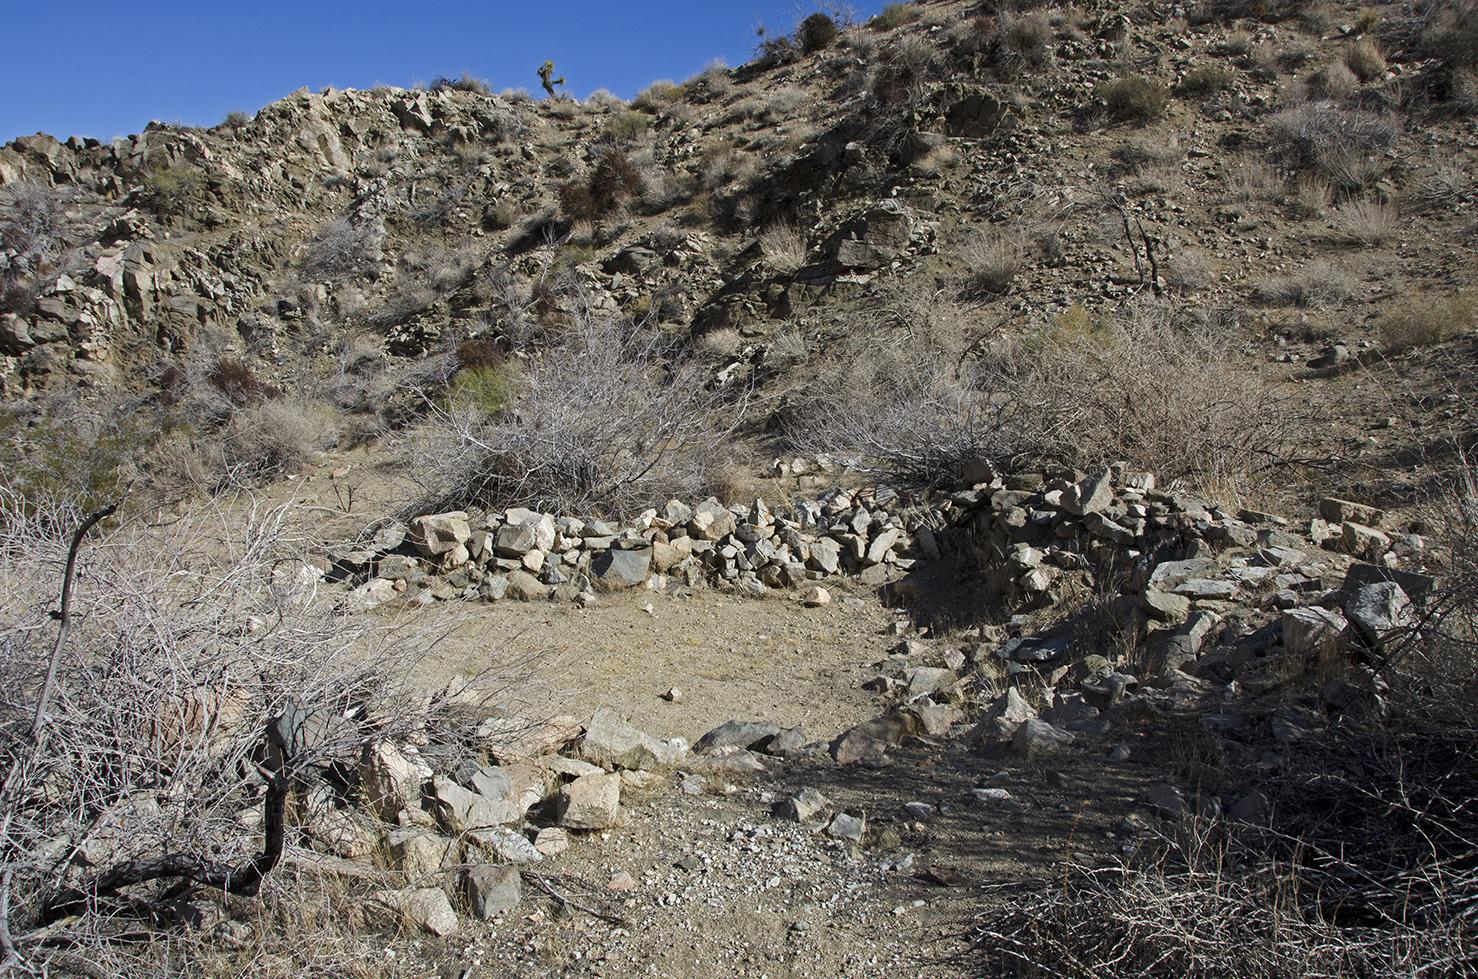 A large stone ruin